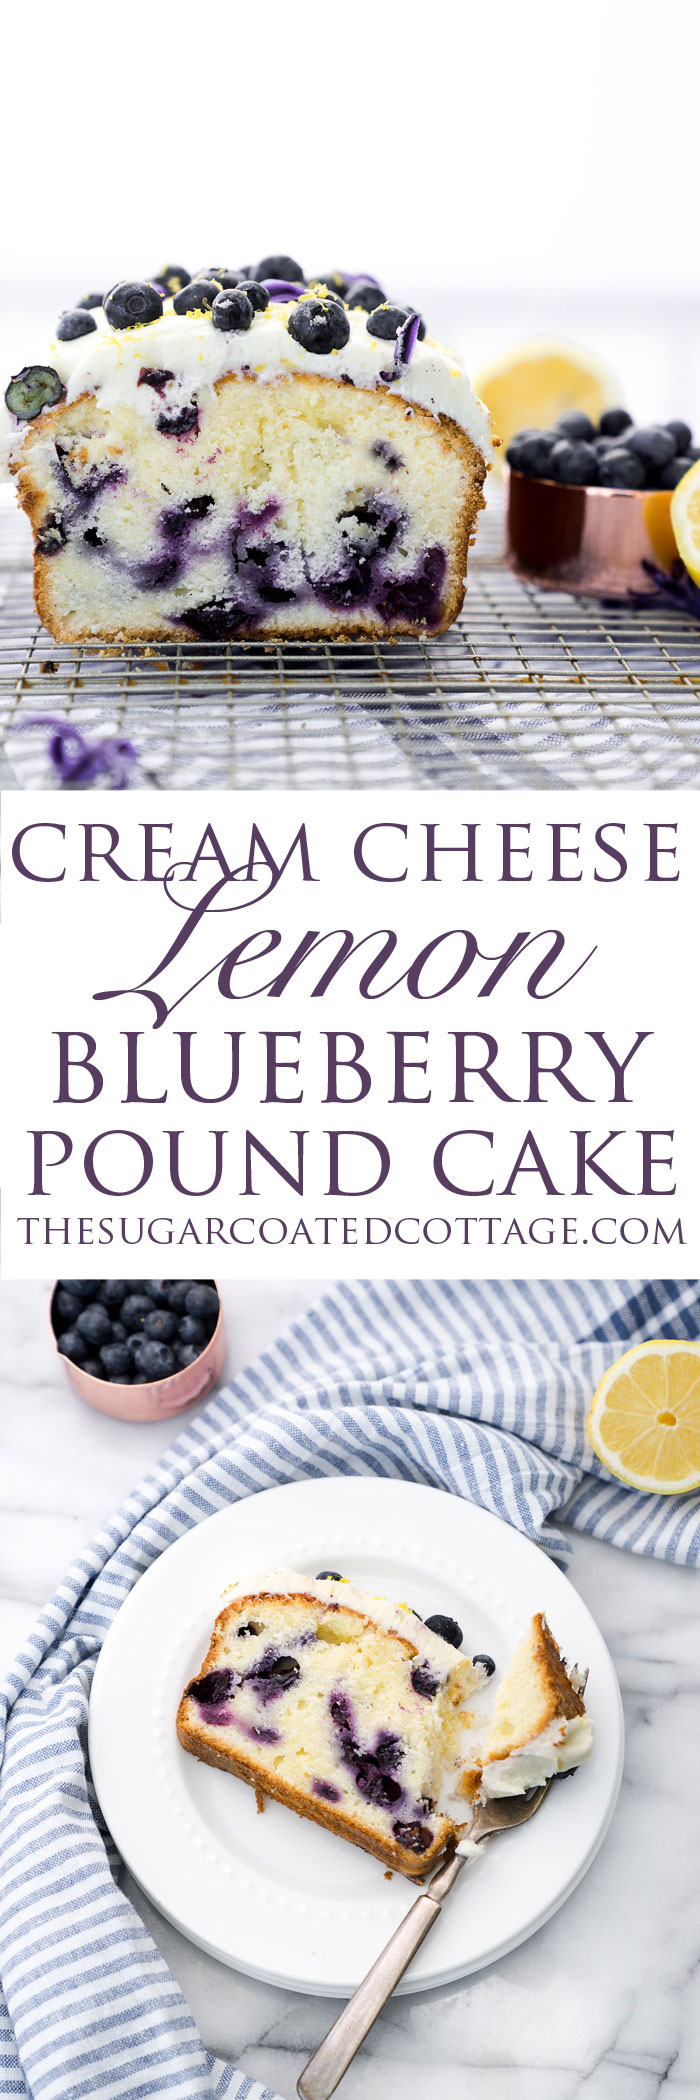 Cream Cheese Lemon Blueberry Pound Cake Recipe